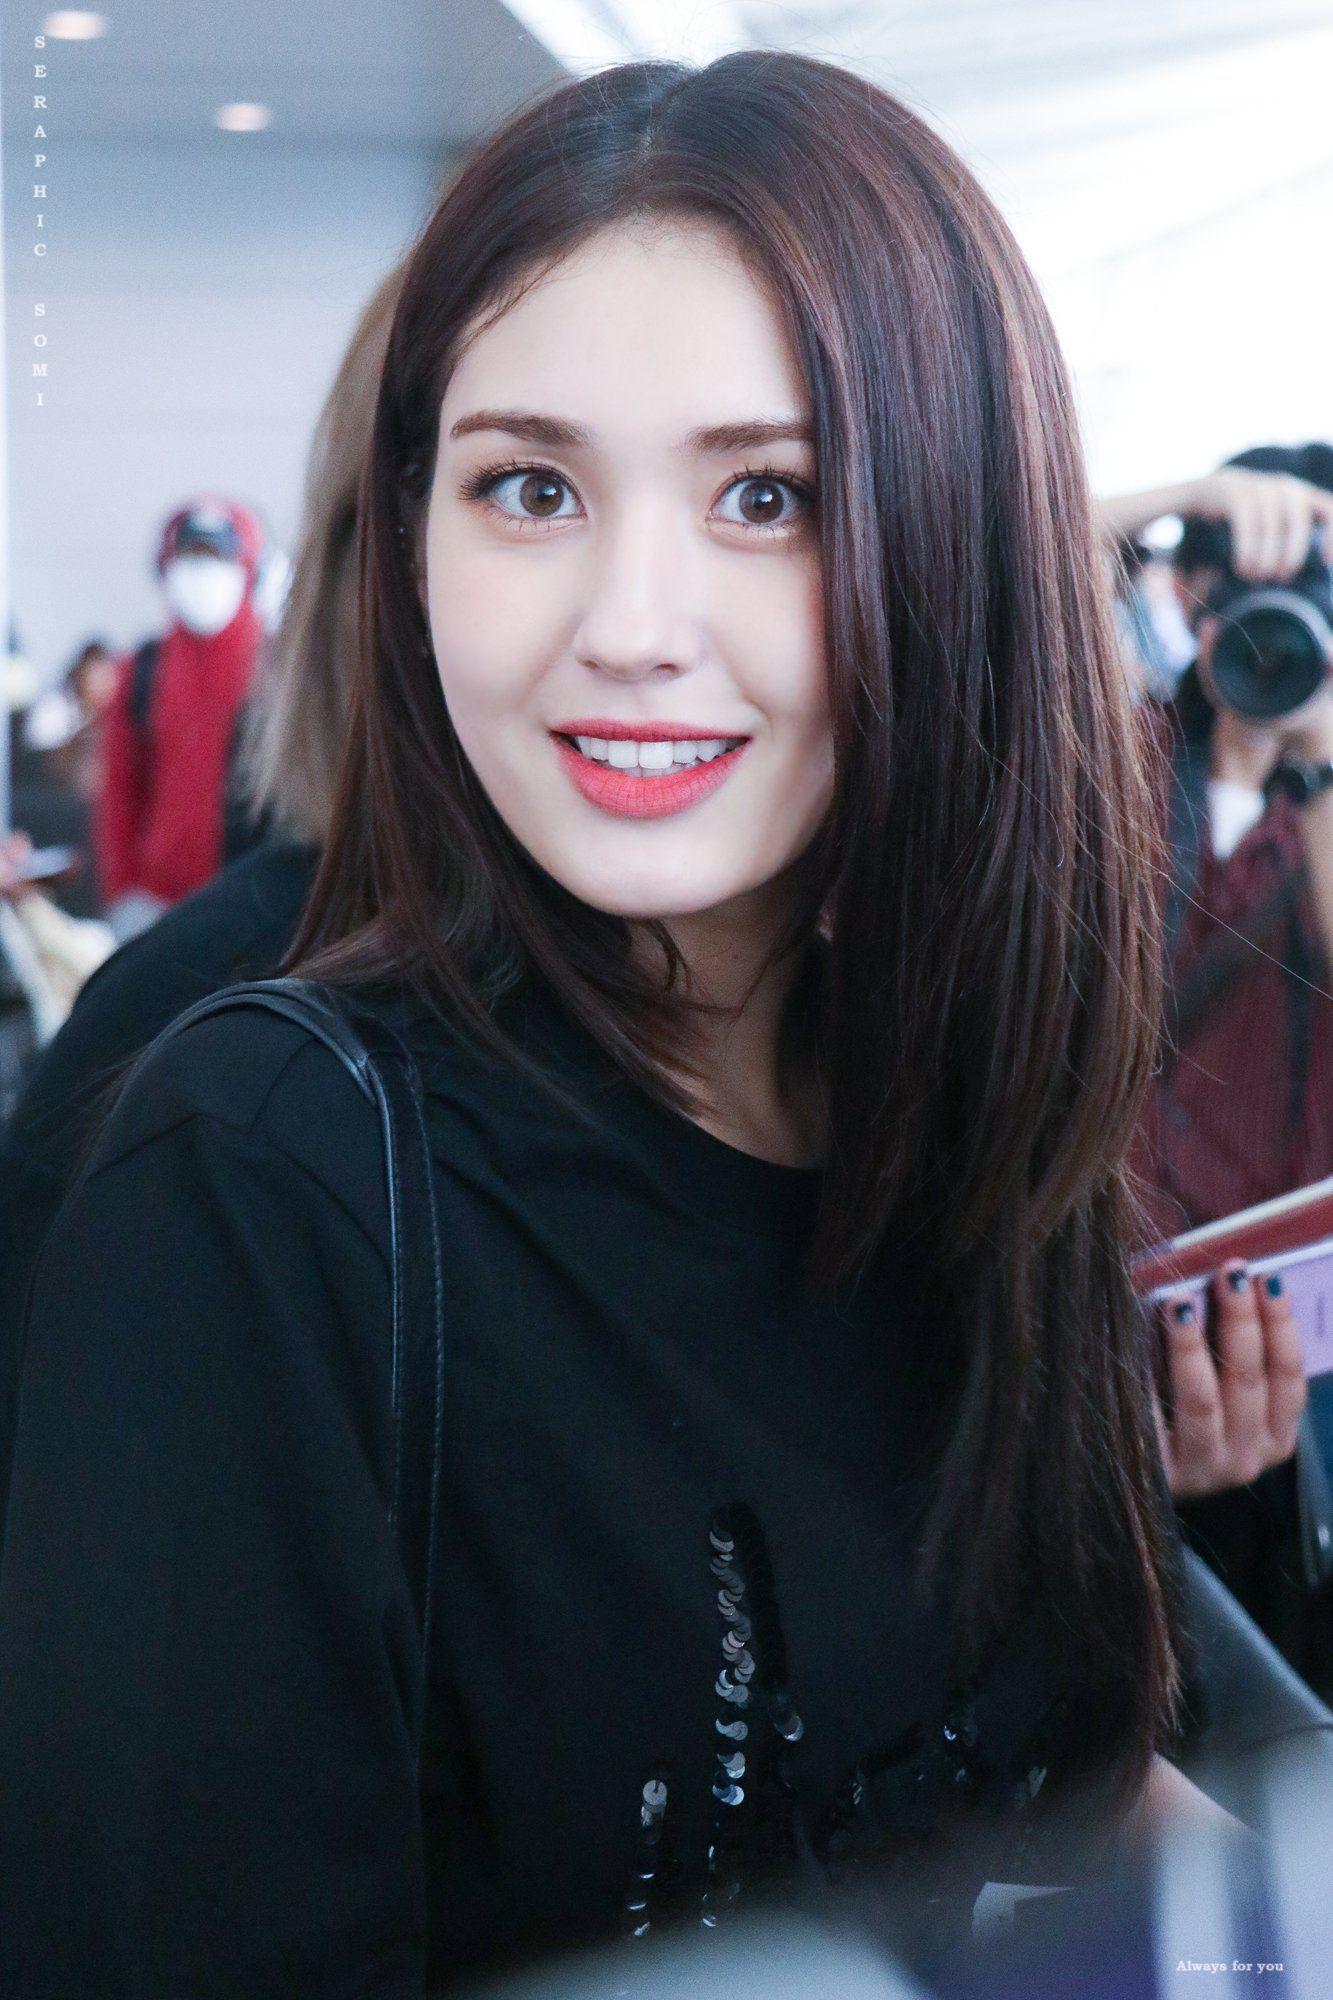 jeon somi | Jeon somi, Retratos de chicas, Fotos tumblr mujer